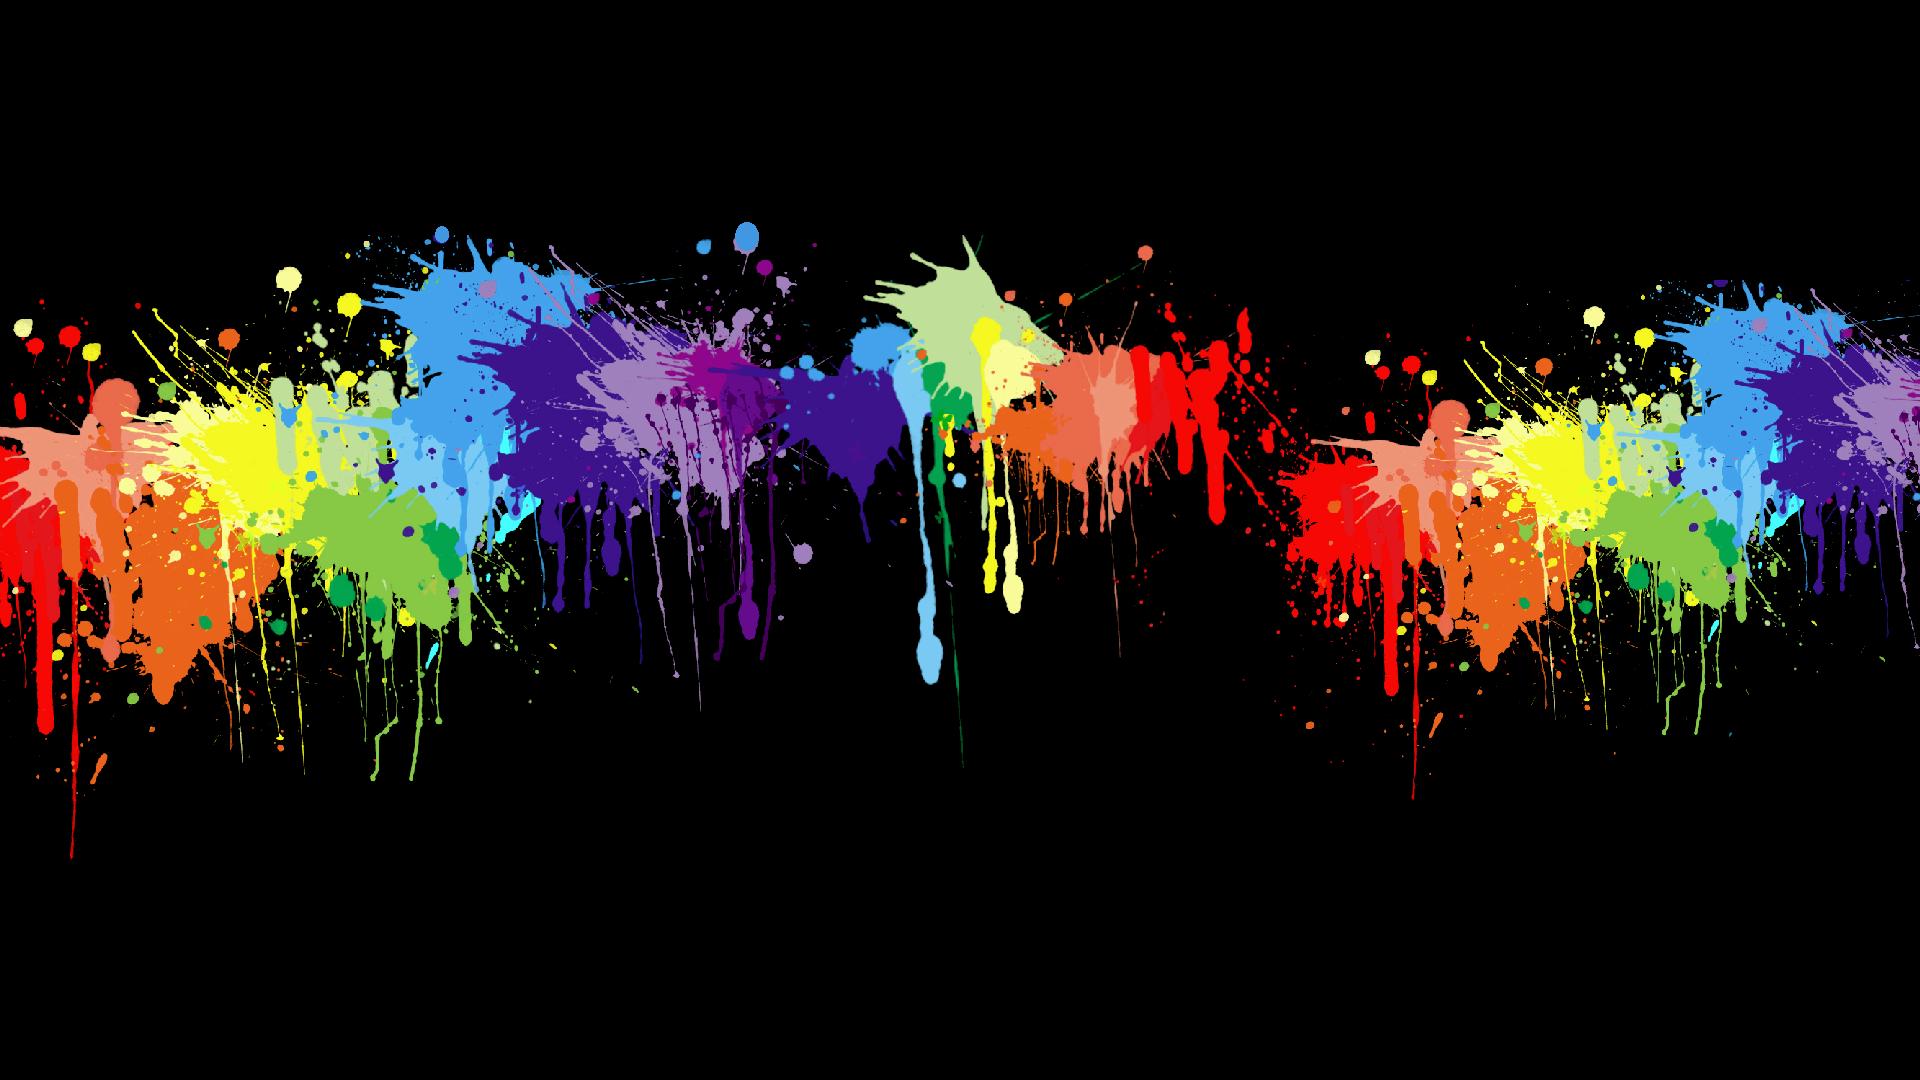 rainbow wallpaper paint images 1920x1080 1920x1080